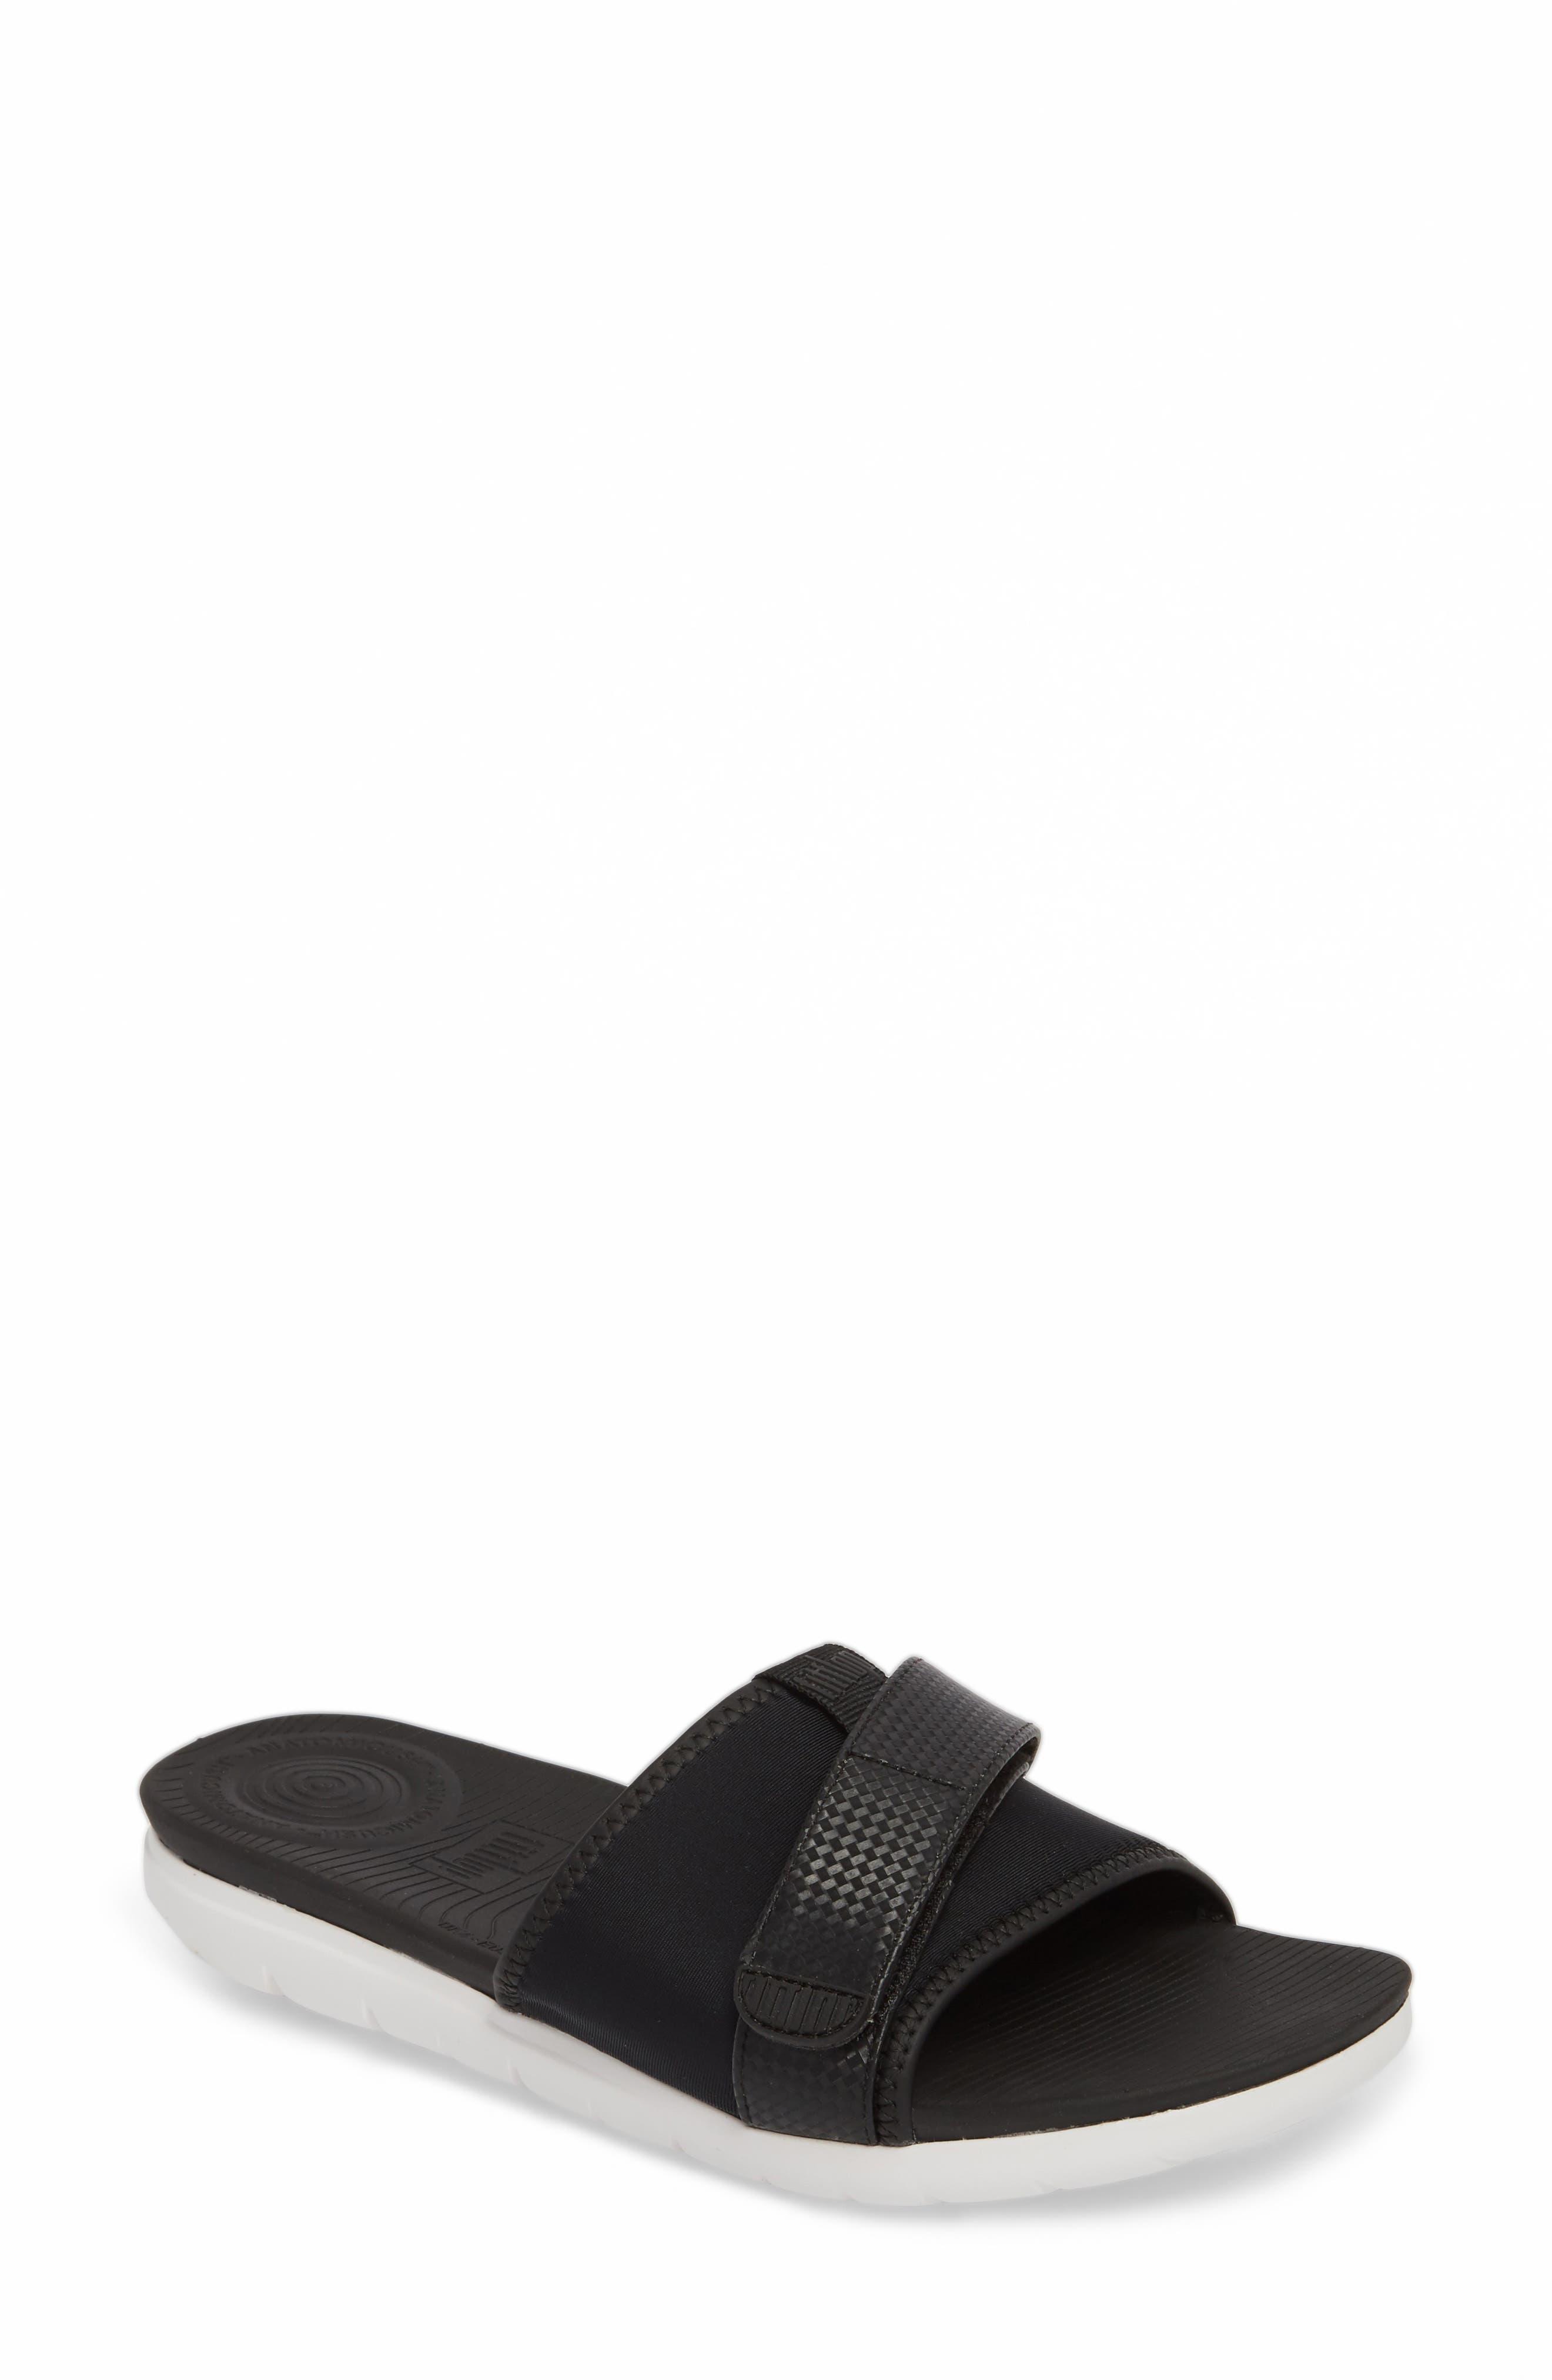 Neoflex Slide Sandal,                         Main,                         color, BLACK FABRIC